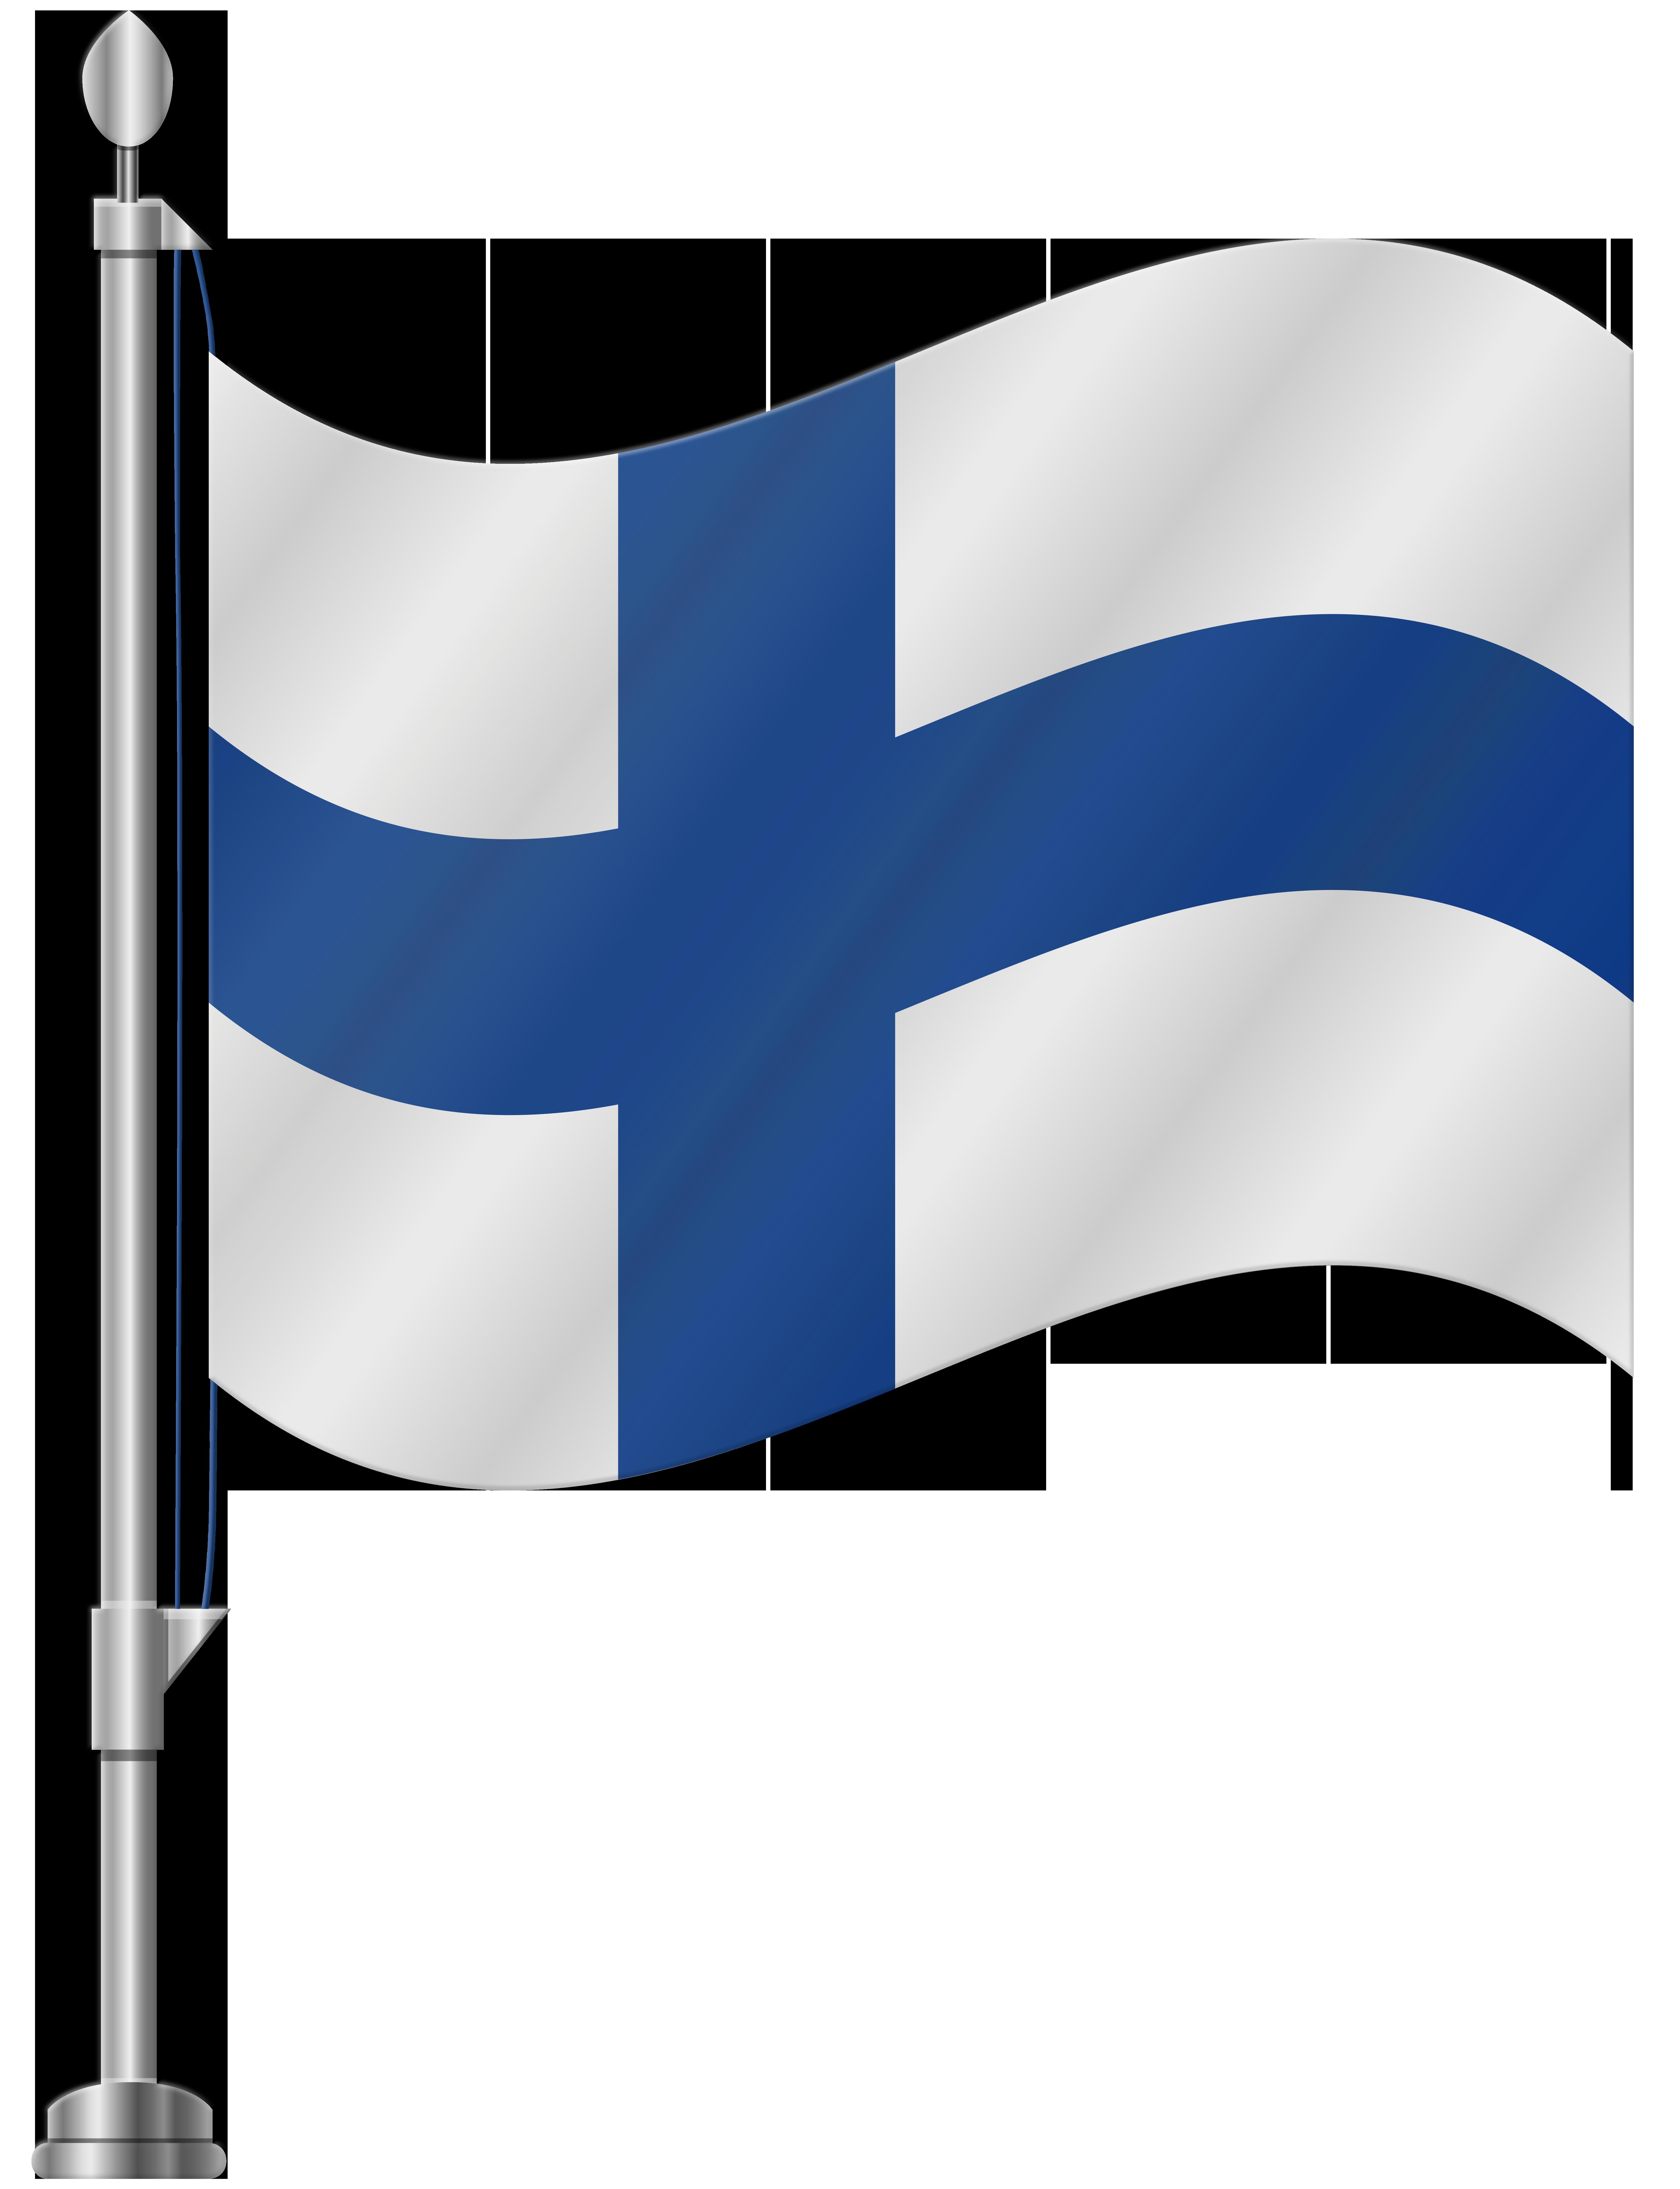 6141x8000 Finland Flag Png Clip Art